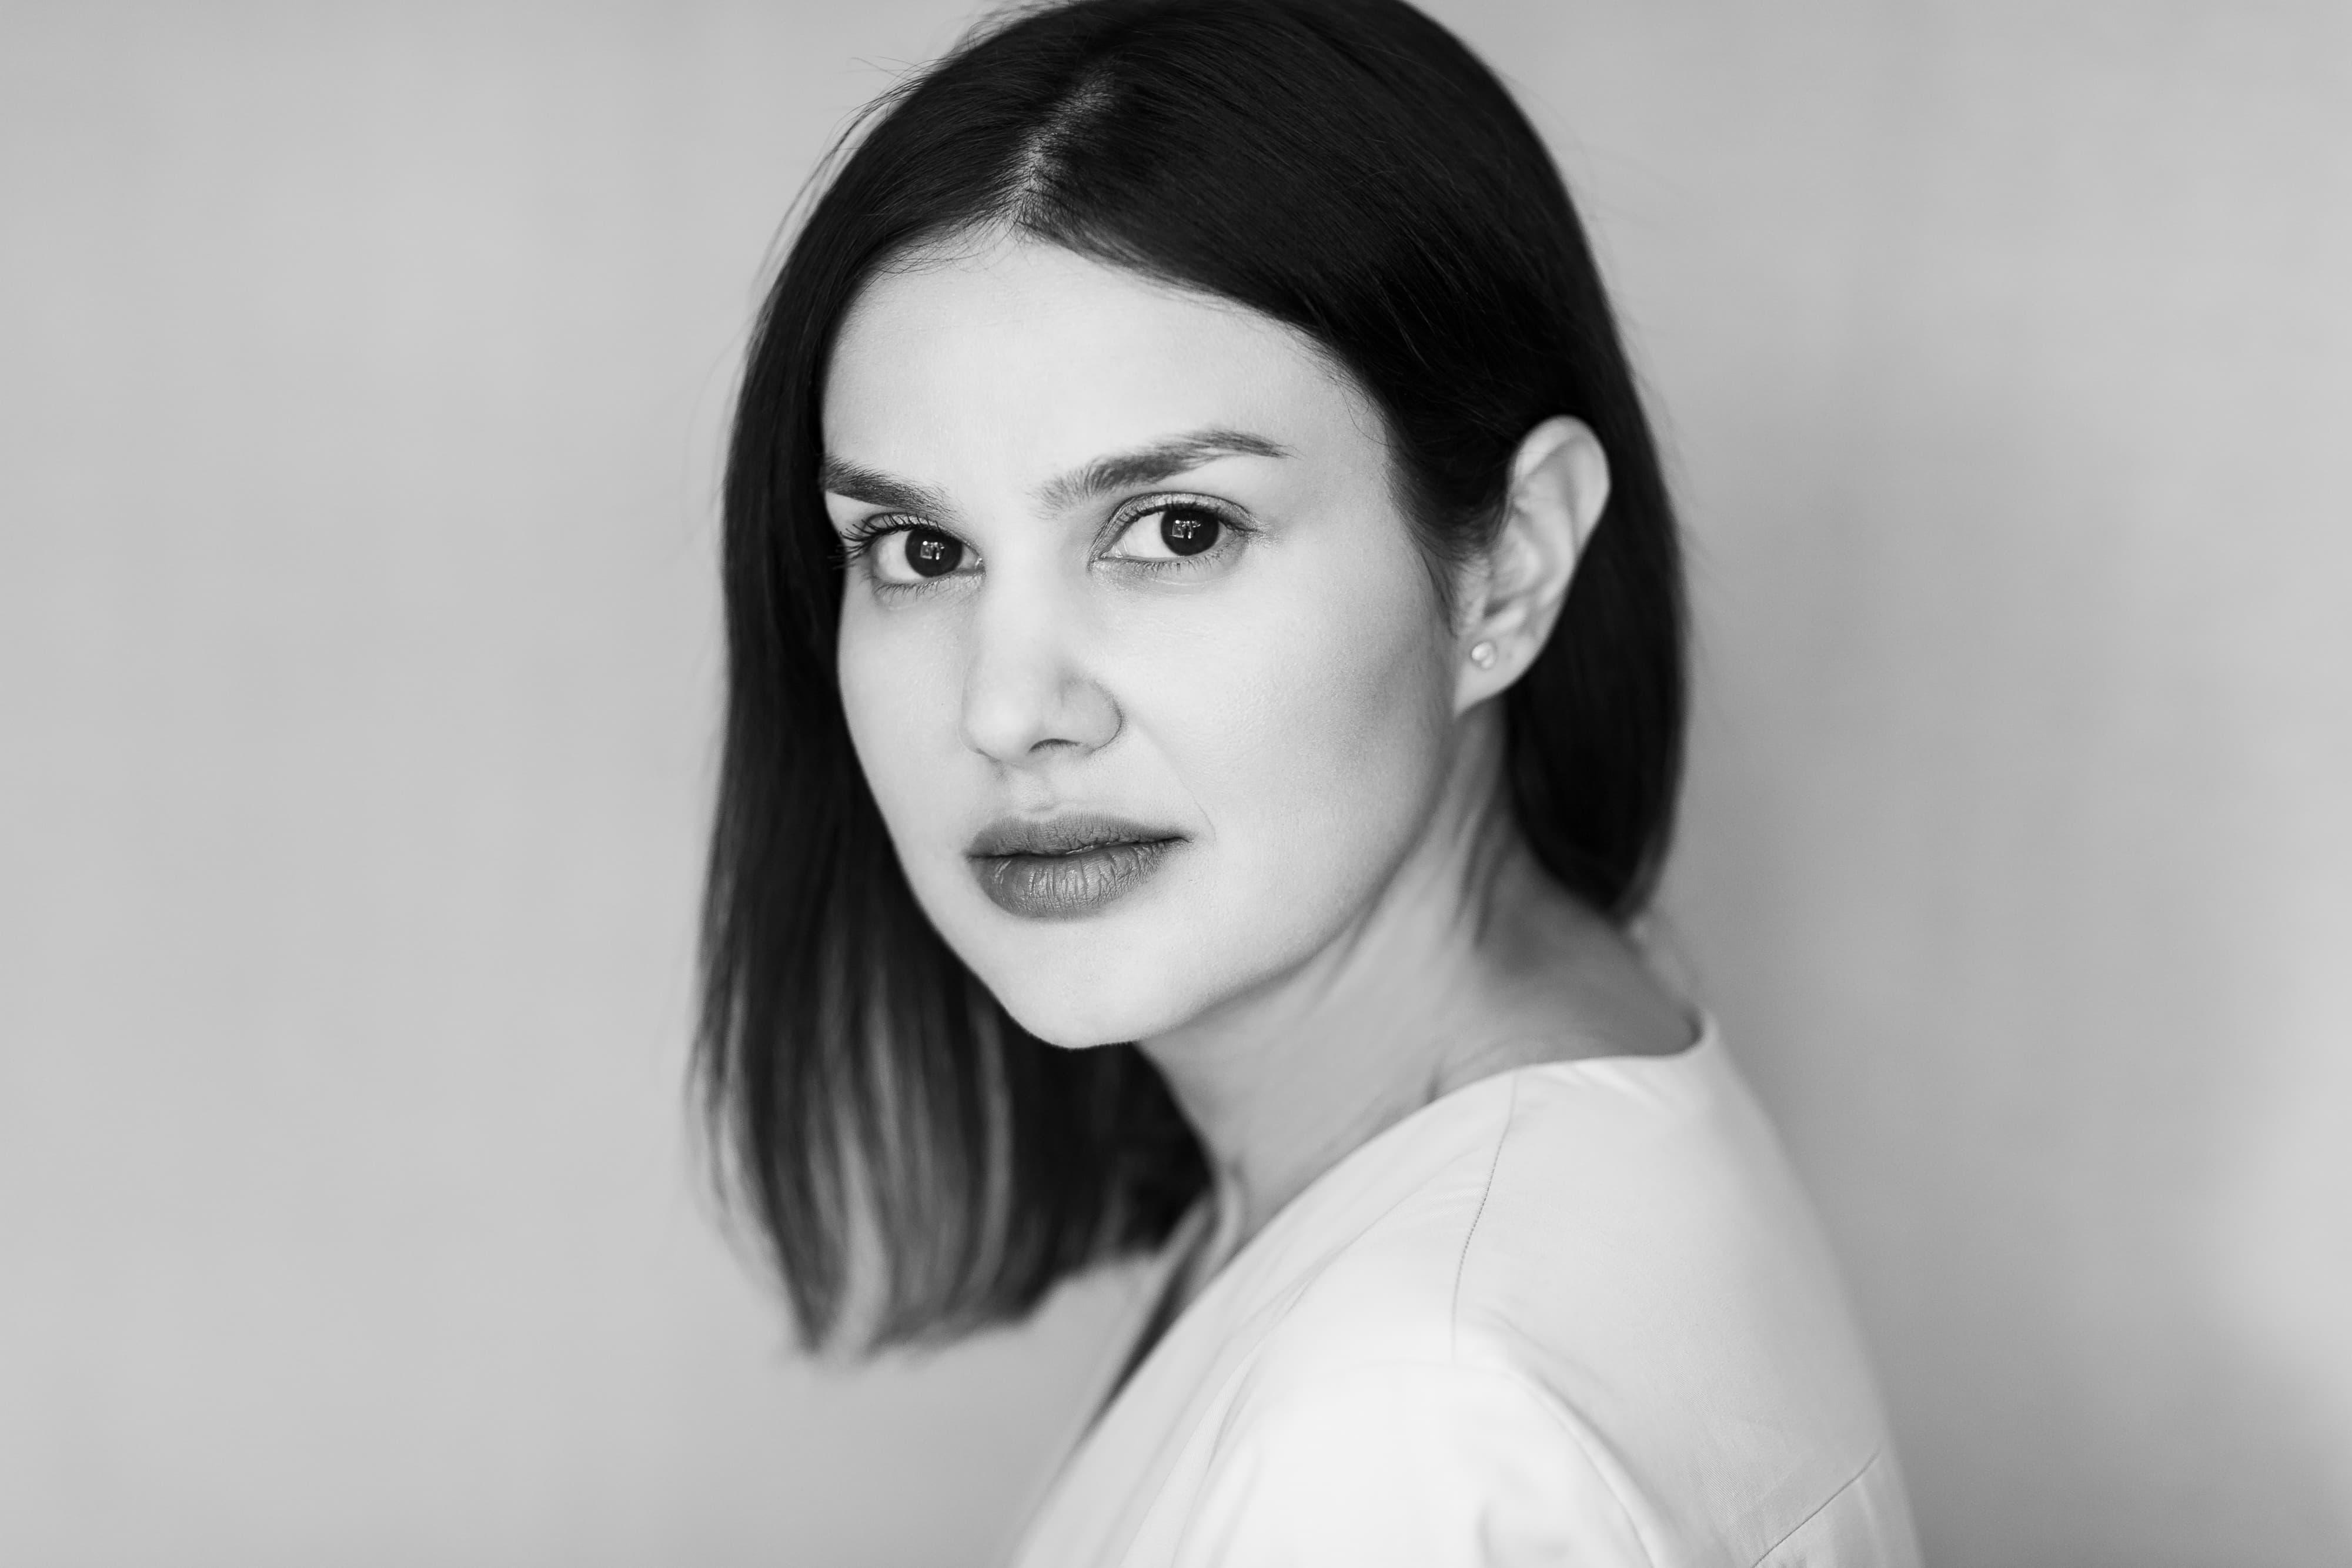 Mara Coman @Harper's Bazaar x The Woman 1